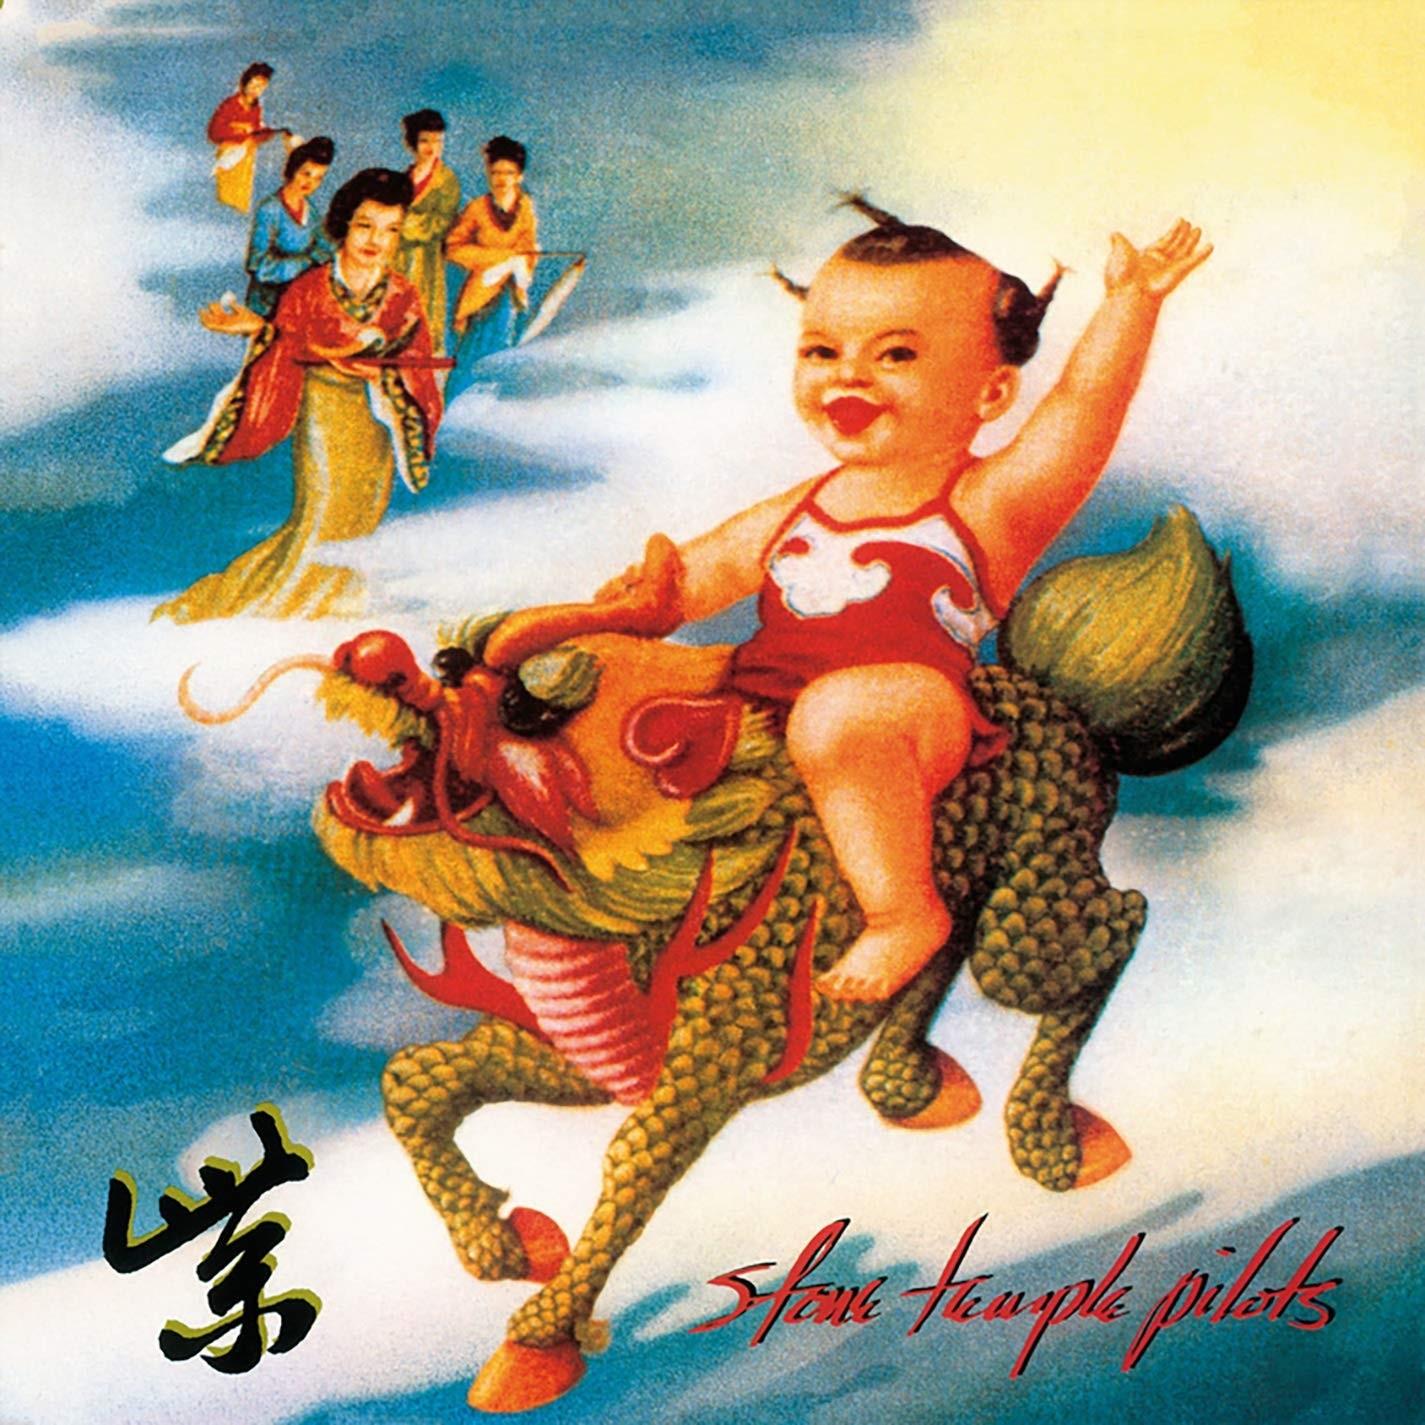 Stone Temple Pilots - Purple (2019 Remaster) Vinyl LP